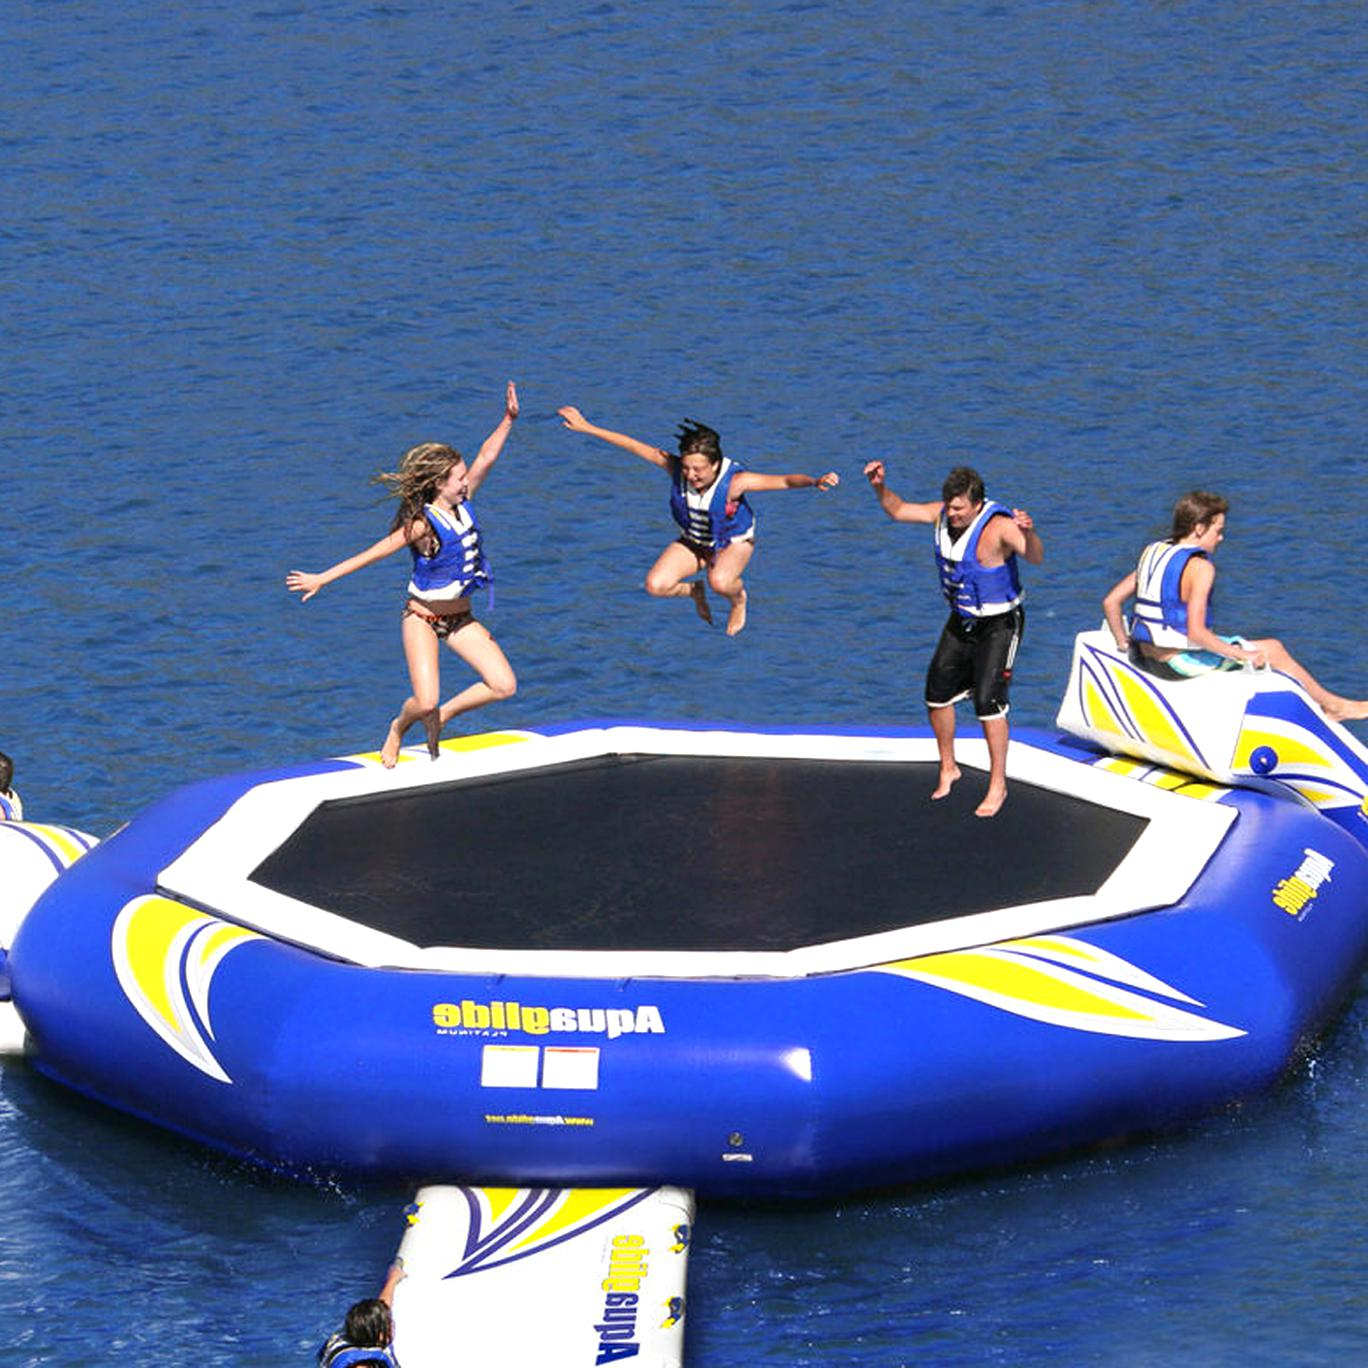 aquaglide water trampoline for sale